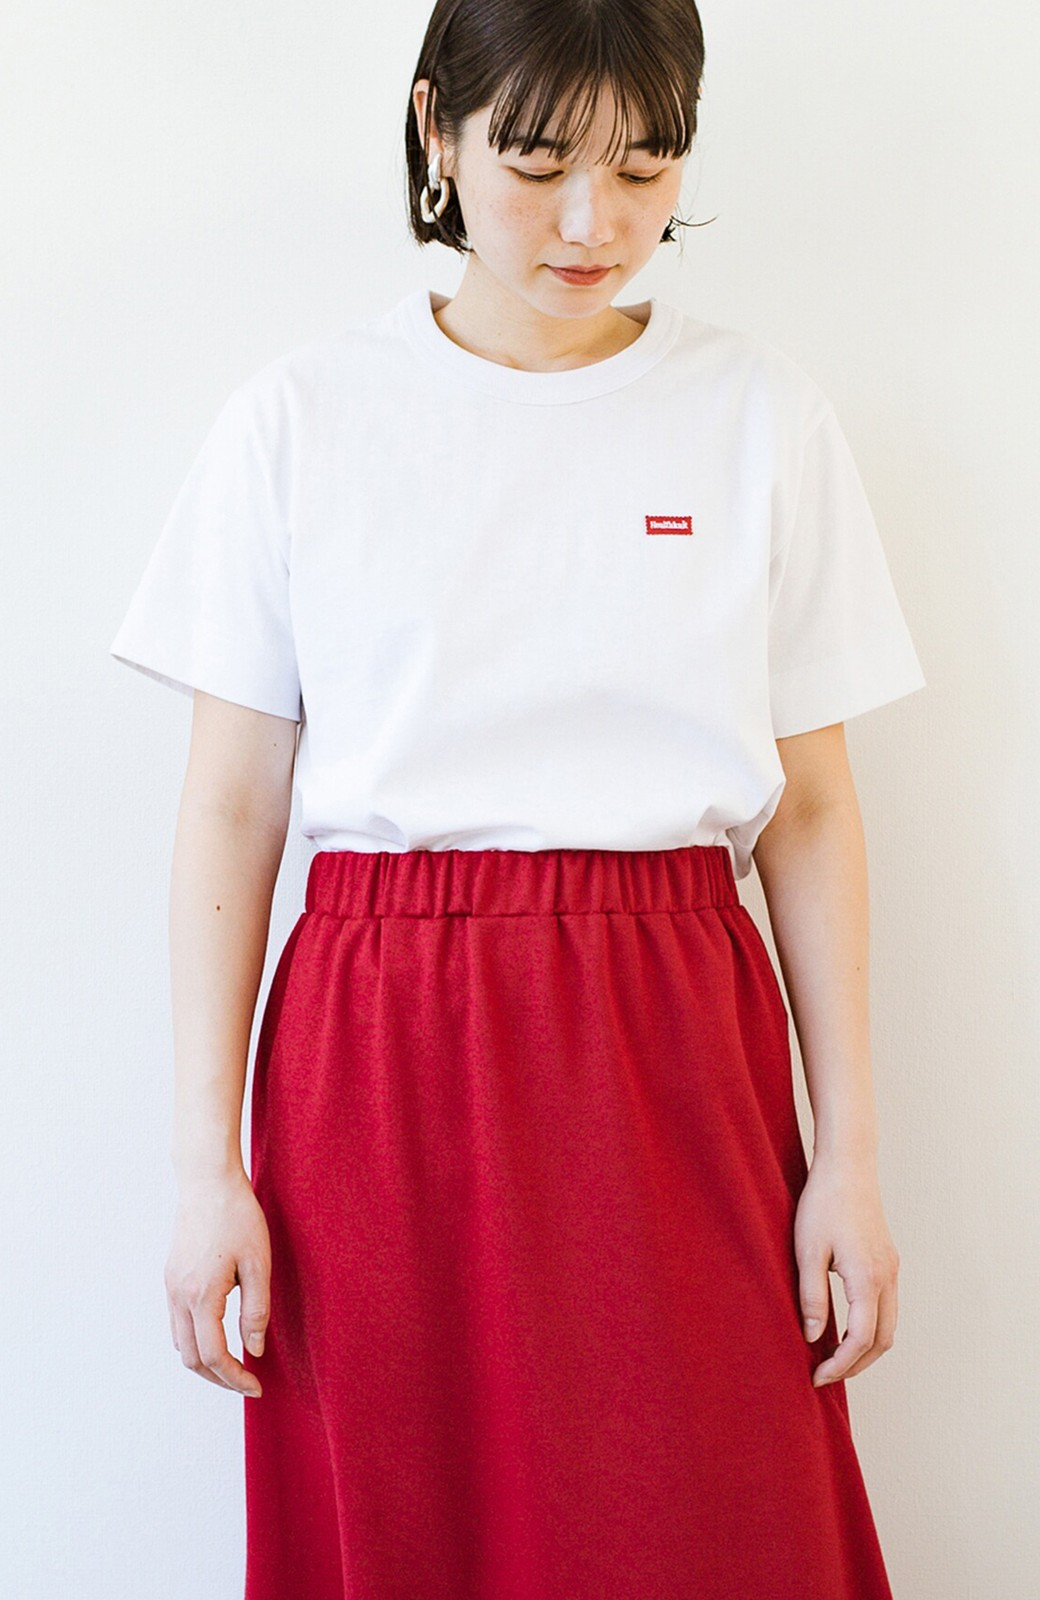 haco! さりげないロゴがコーデのポイントになるファンクションファブリックジャージークルーネックTシャツ by Healthknit <ホワイト>の商品写真2